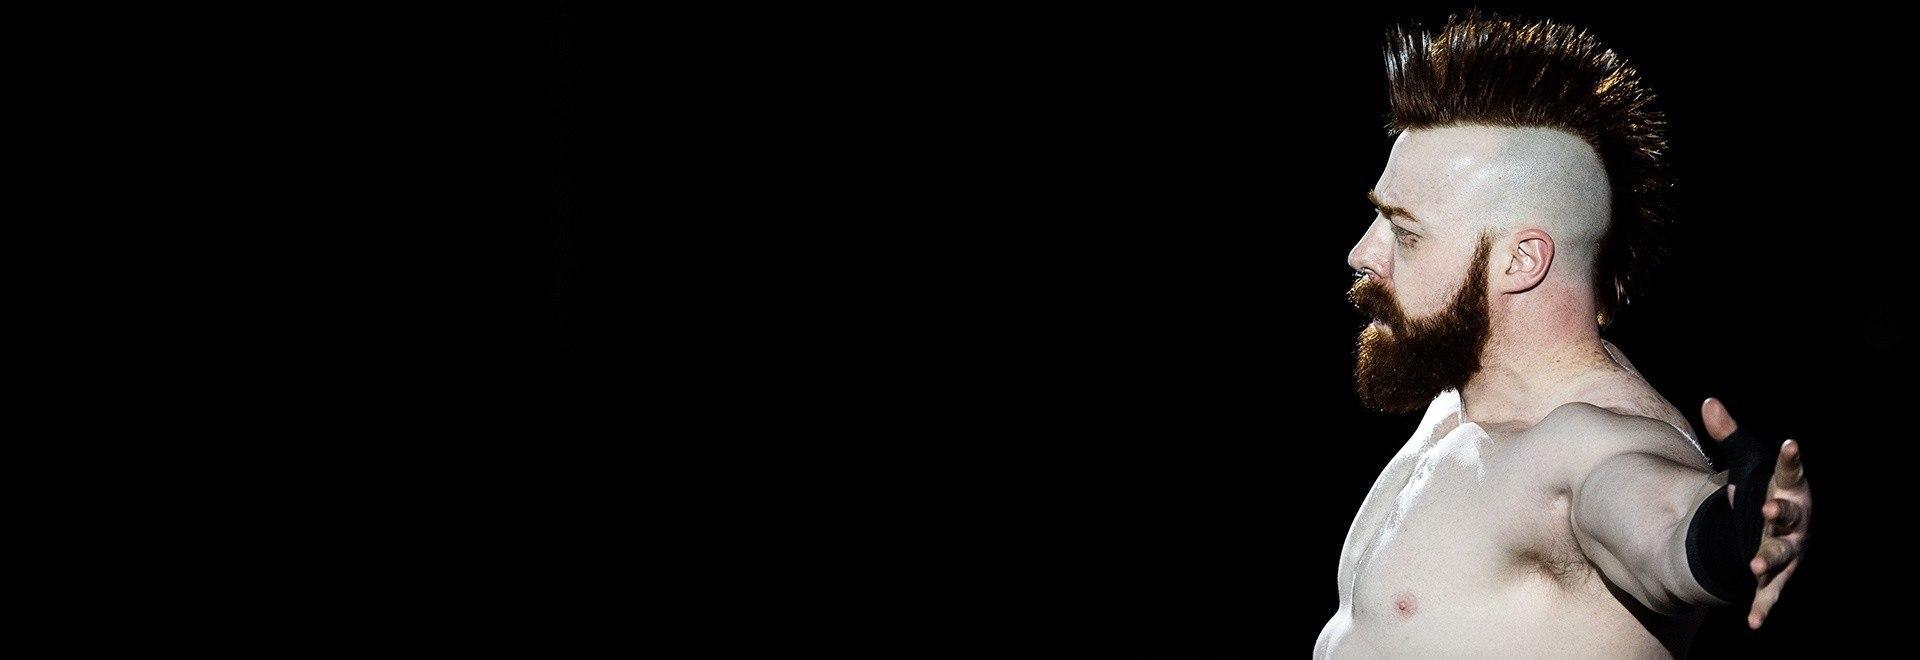 Ep. 242